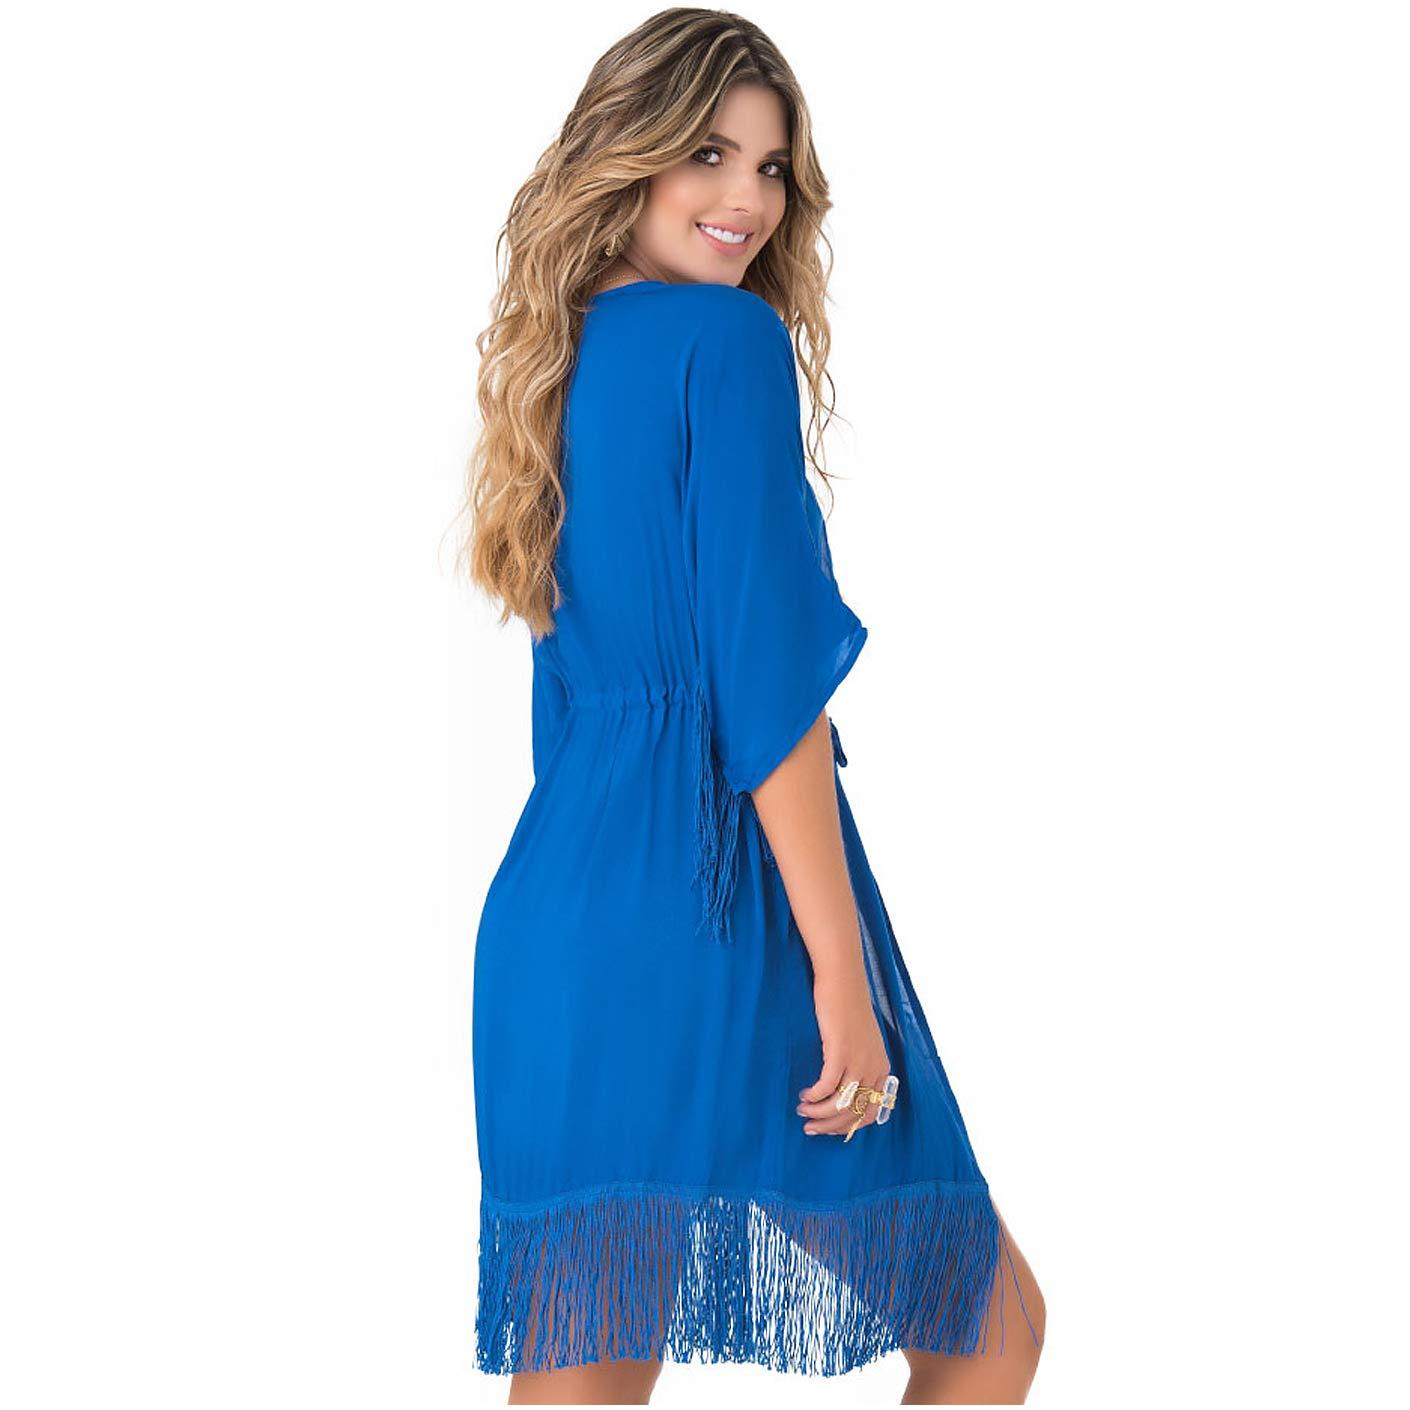 PHAX Colombian Swimwear Kimono Cardigan for Women | Salidas de Playa para Mujer at Amazon Womens Clothing store: